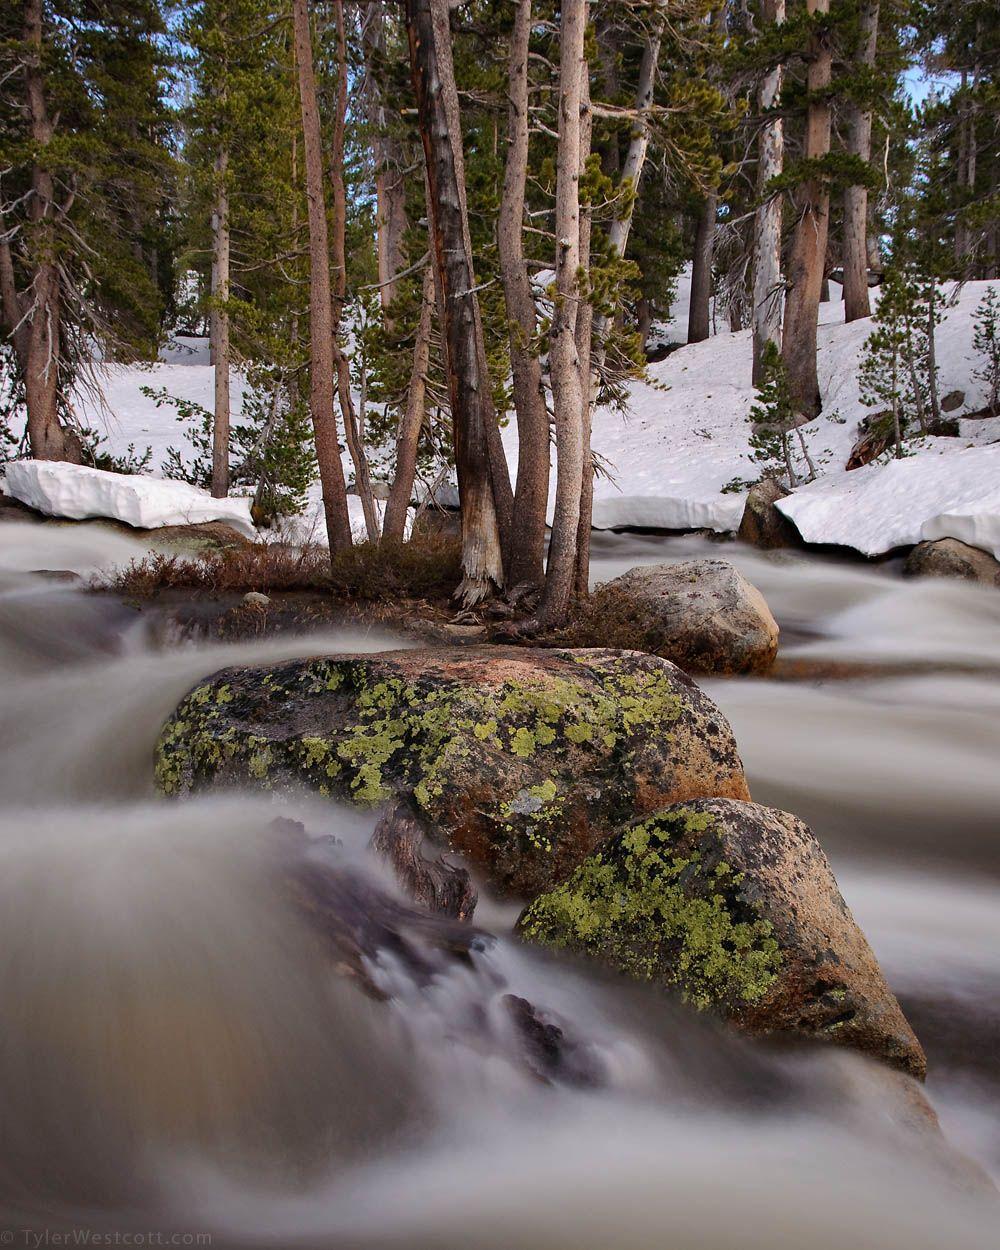 Dana Fork, Tuolumne River, Yosemite National Park, California, USA